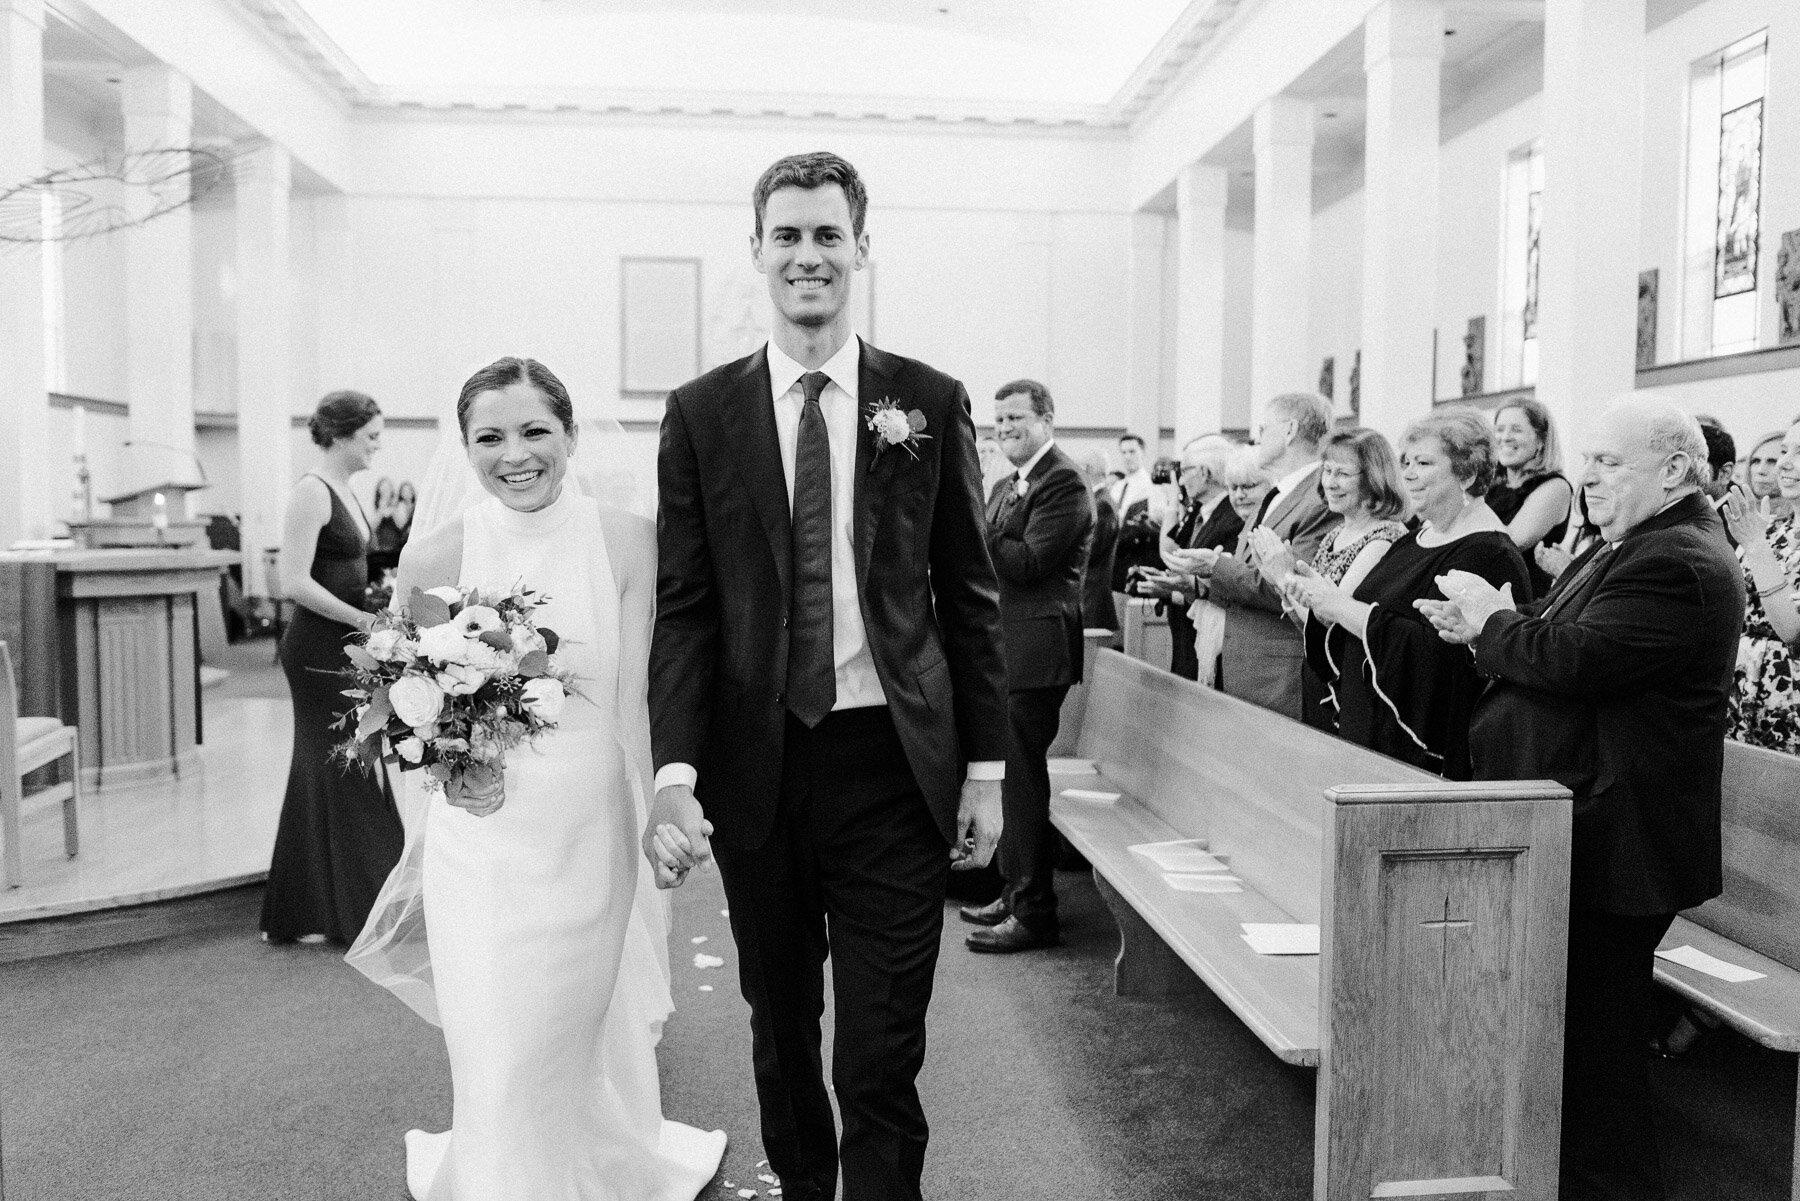 Adelphi Saratoga Wedding by Michelle Lange Photography-25.jpg